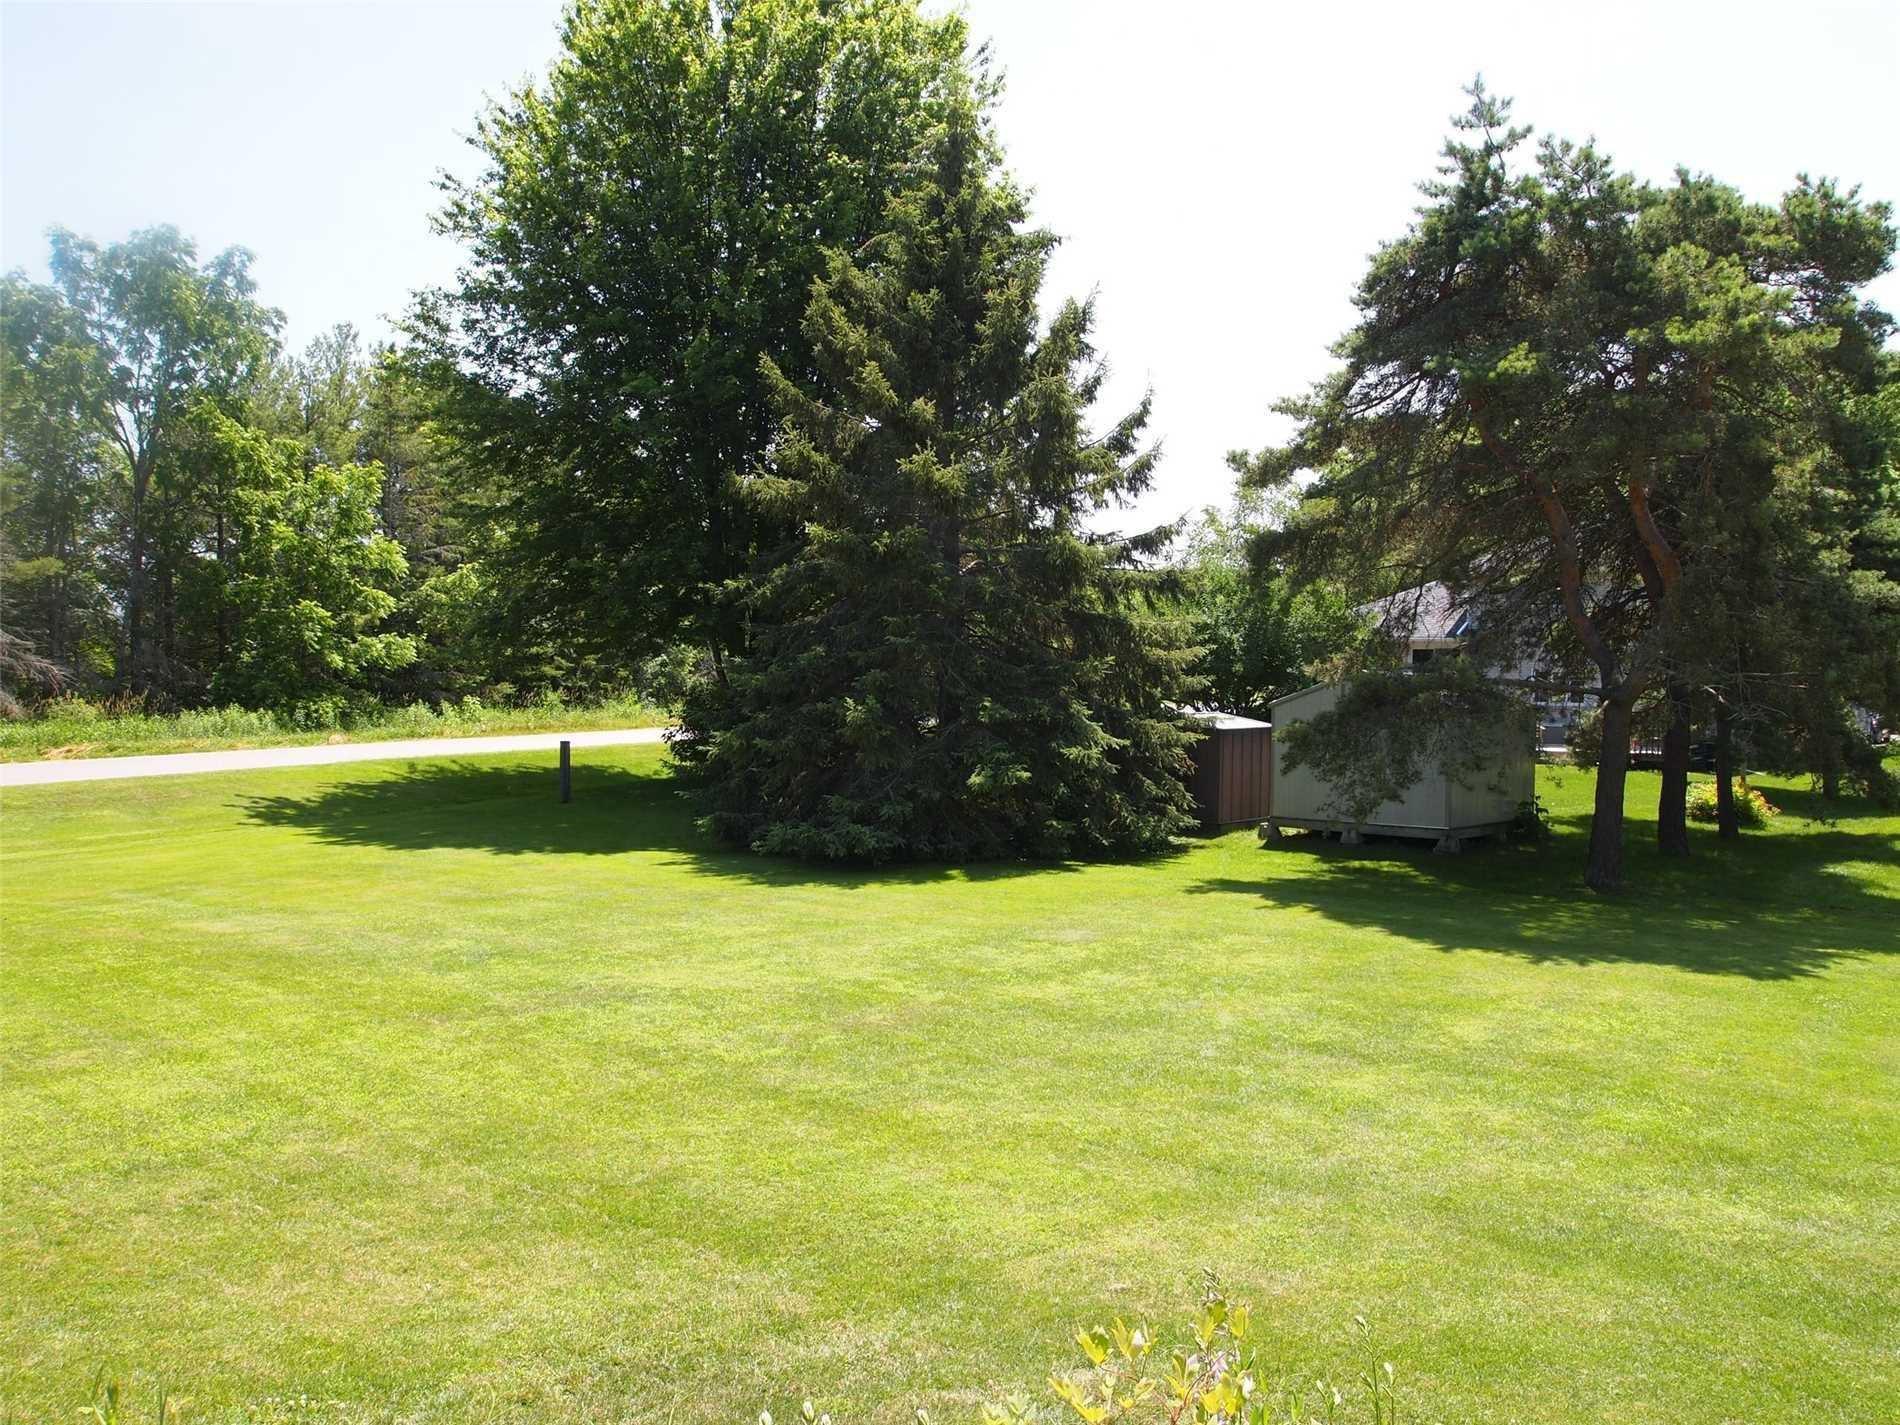 Photo 3: Photos: 105 Fifth Street in Brock: Beaverton House (Bungalow) for sale : MLS®# N4564596